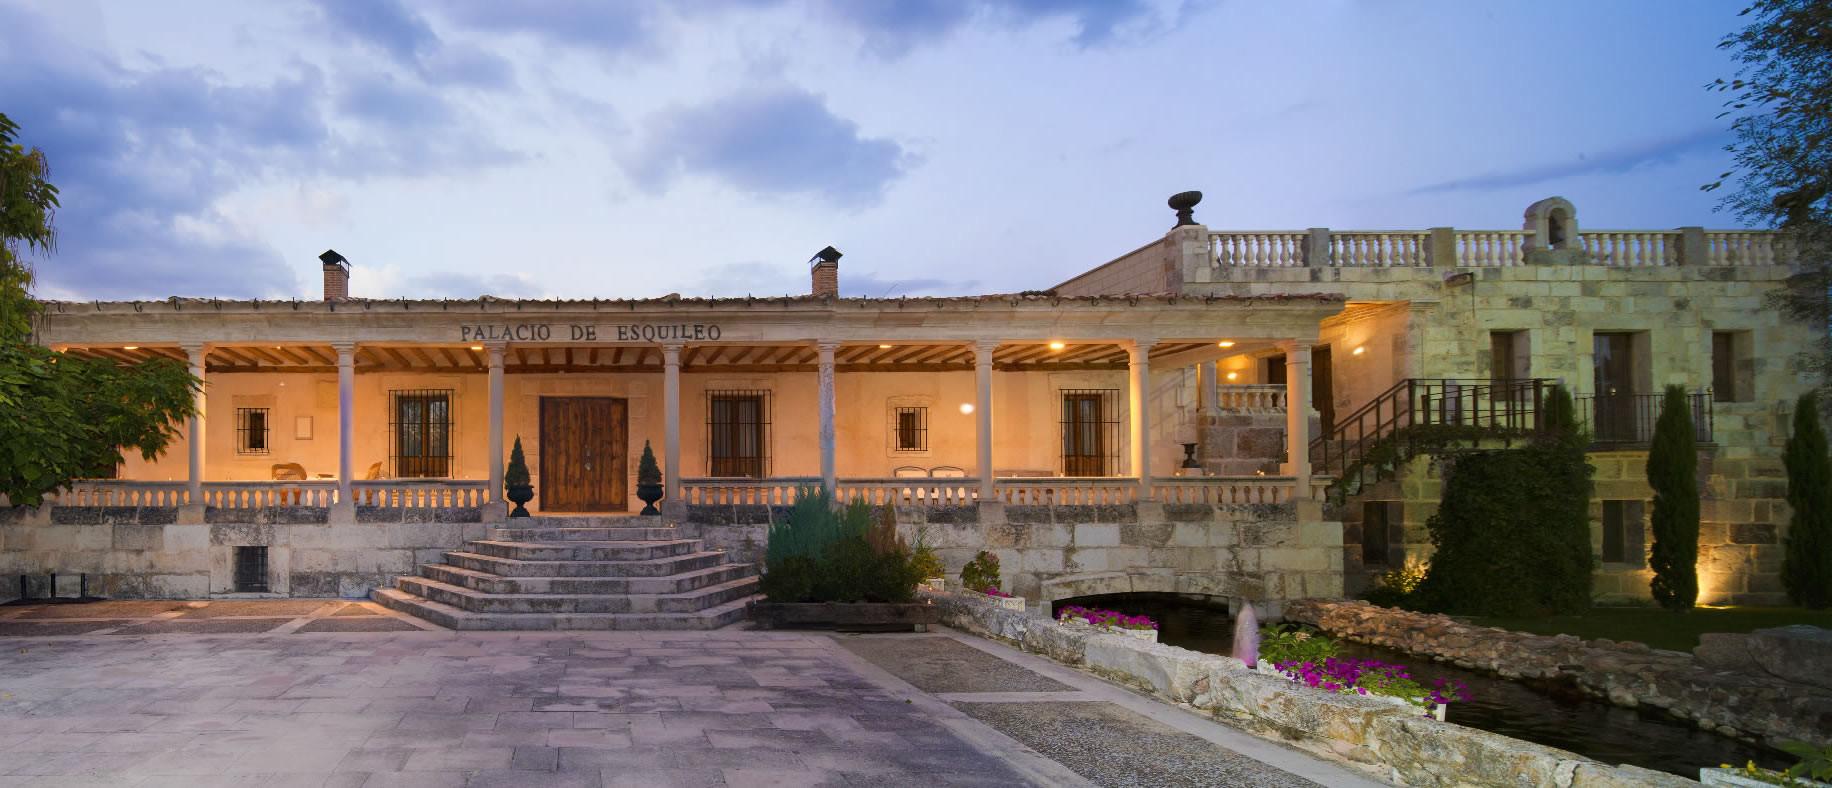 3 Shear Palace